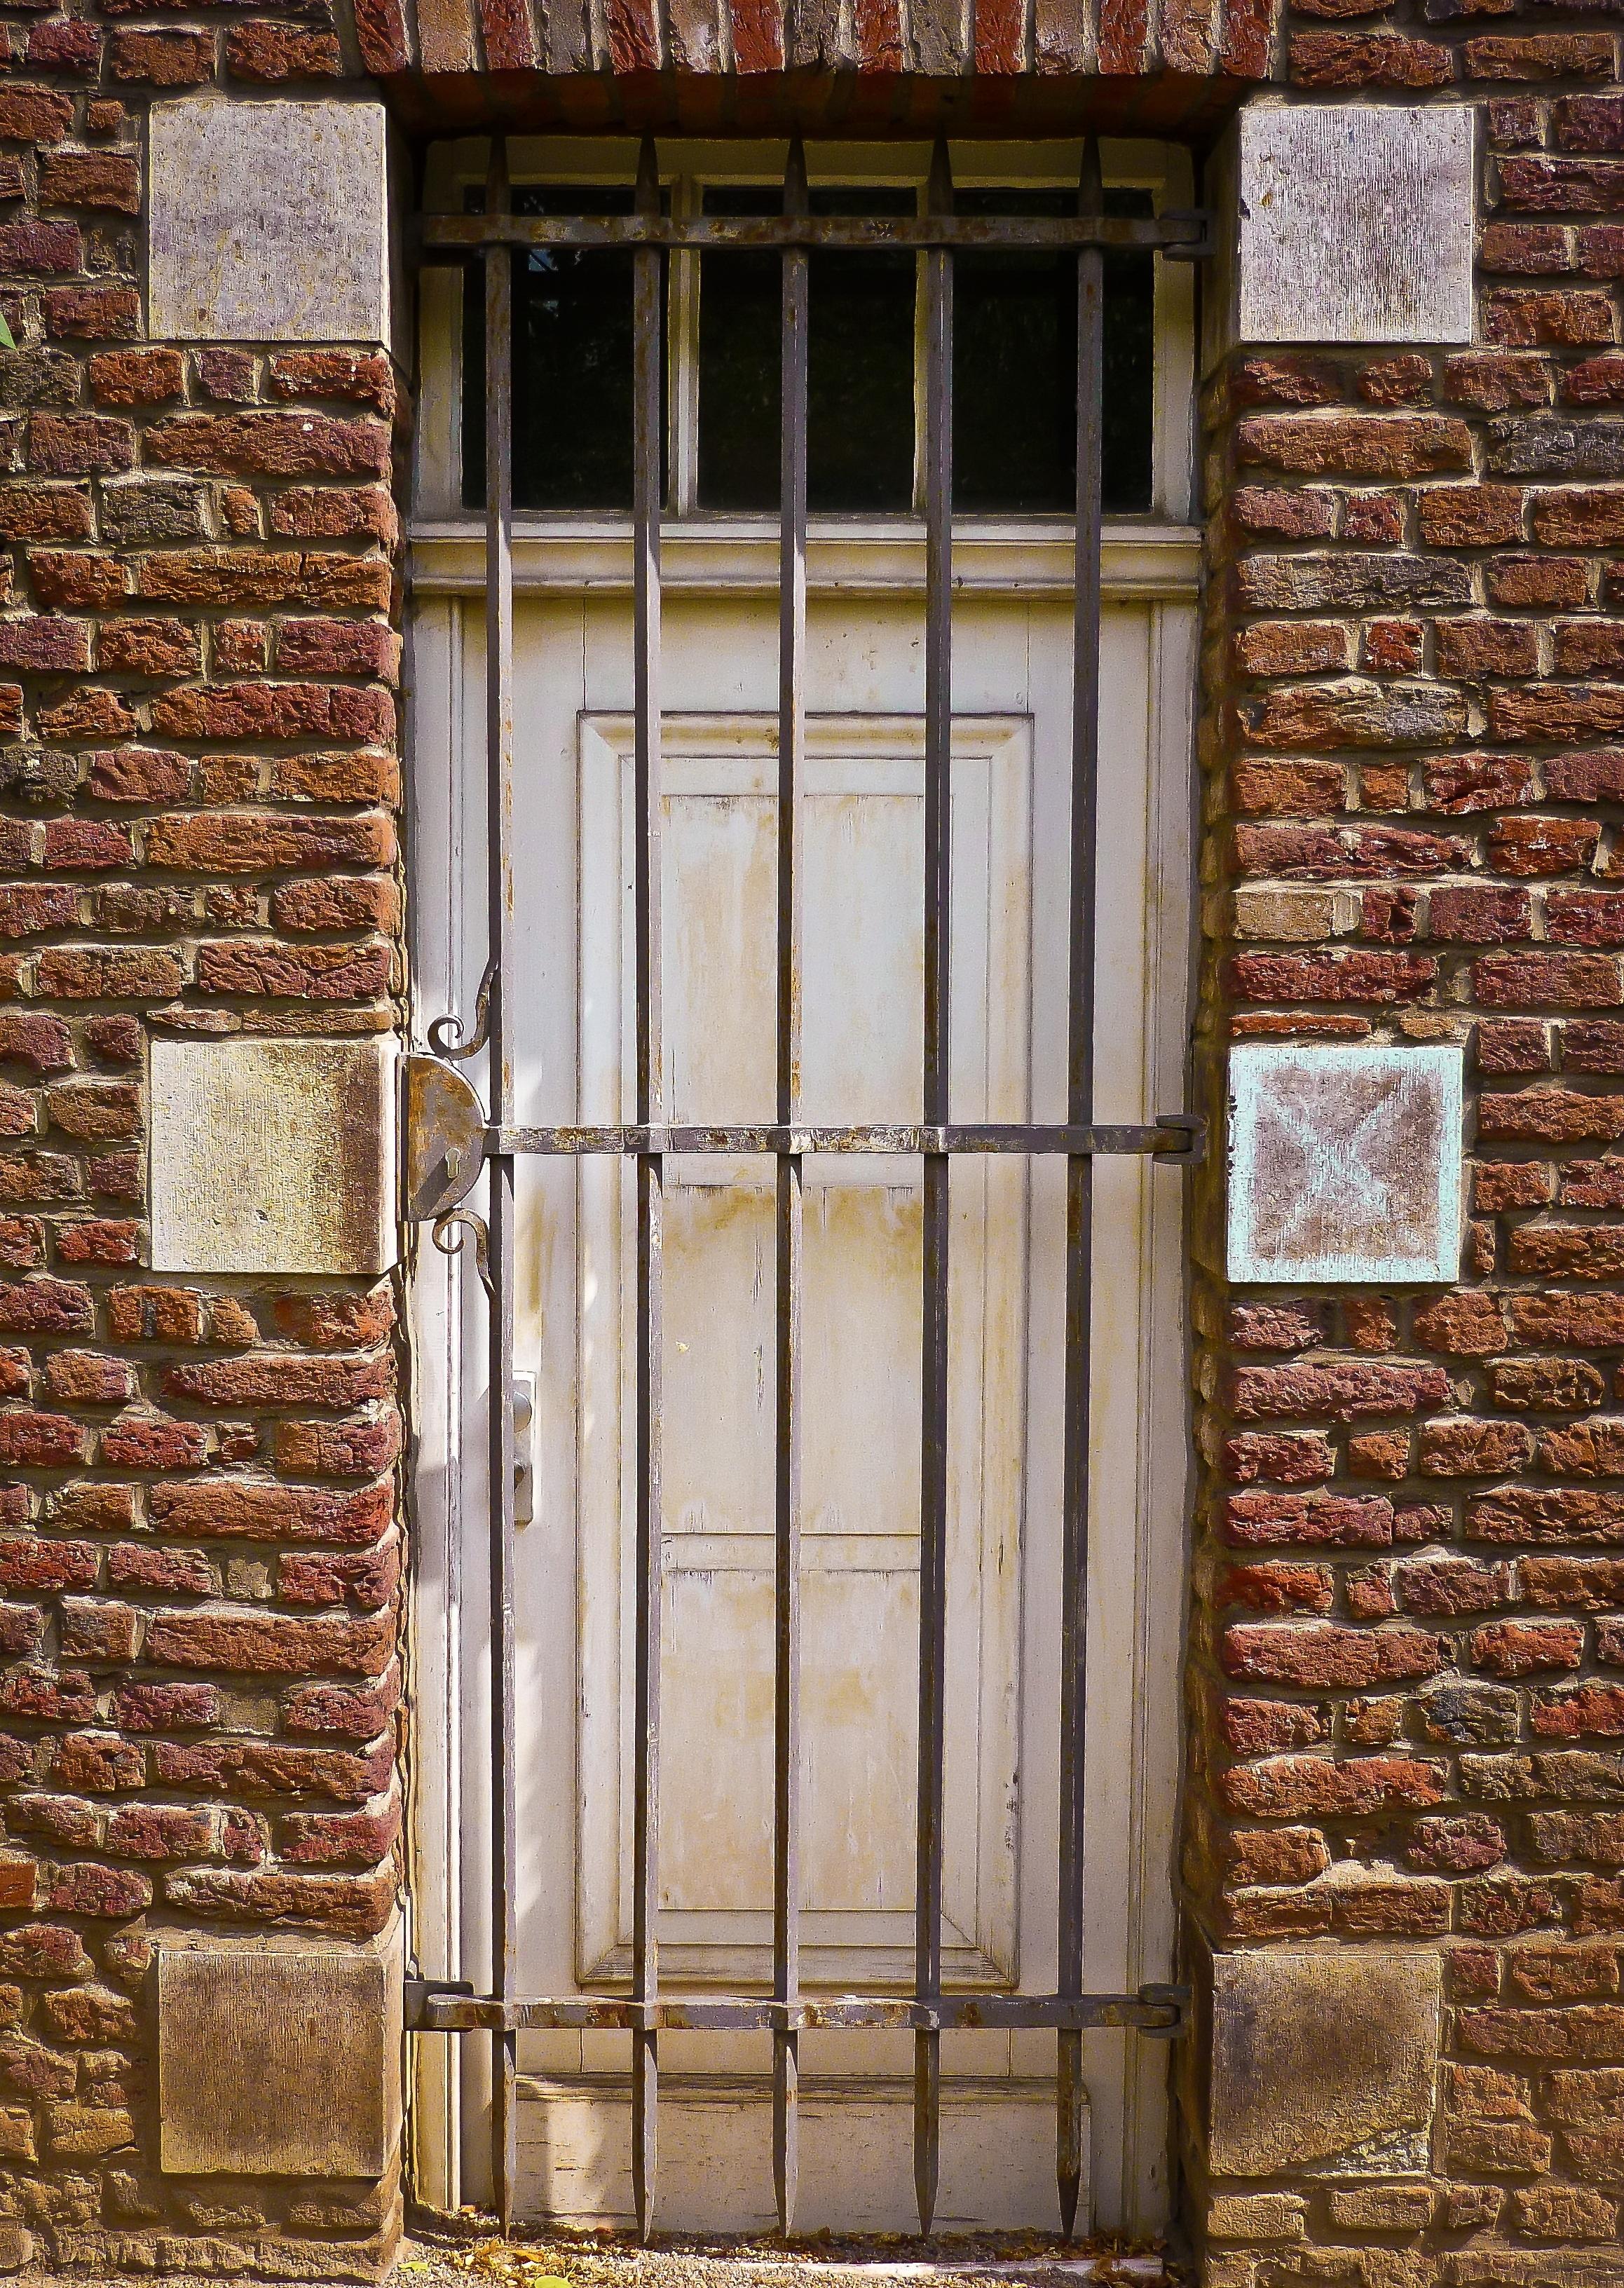 Wood Window Building Old Wall Stone Metal Facade Brick Door Material  Interior Design Grid Brickwork Iron